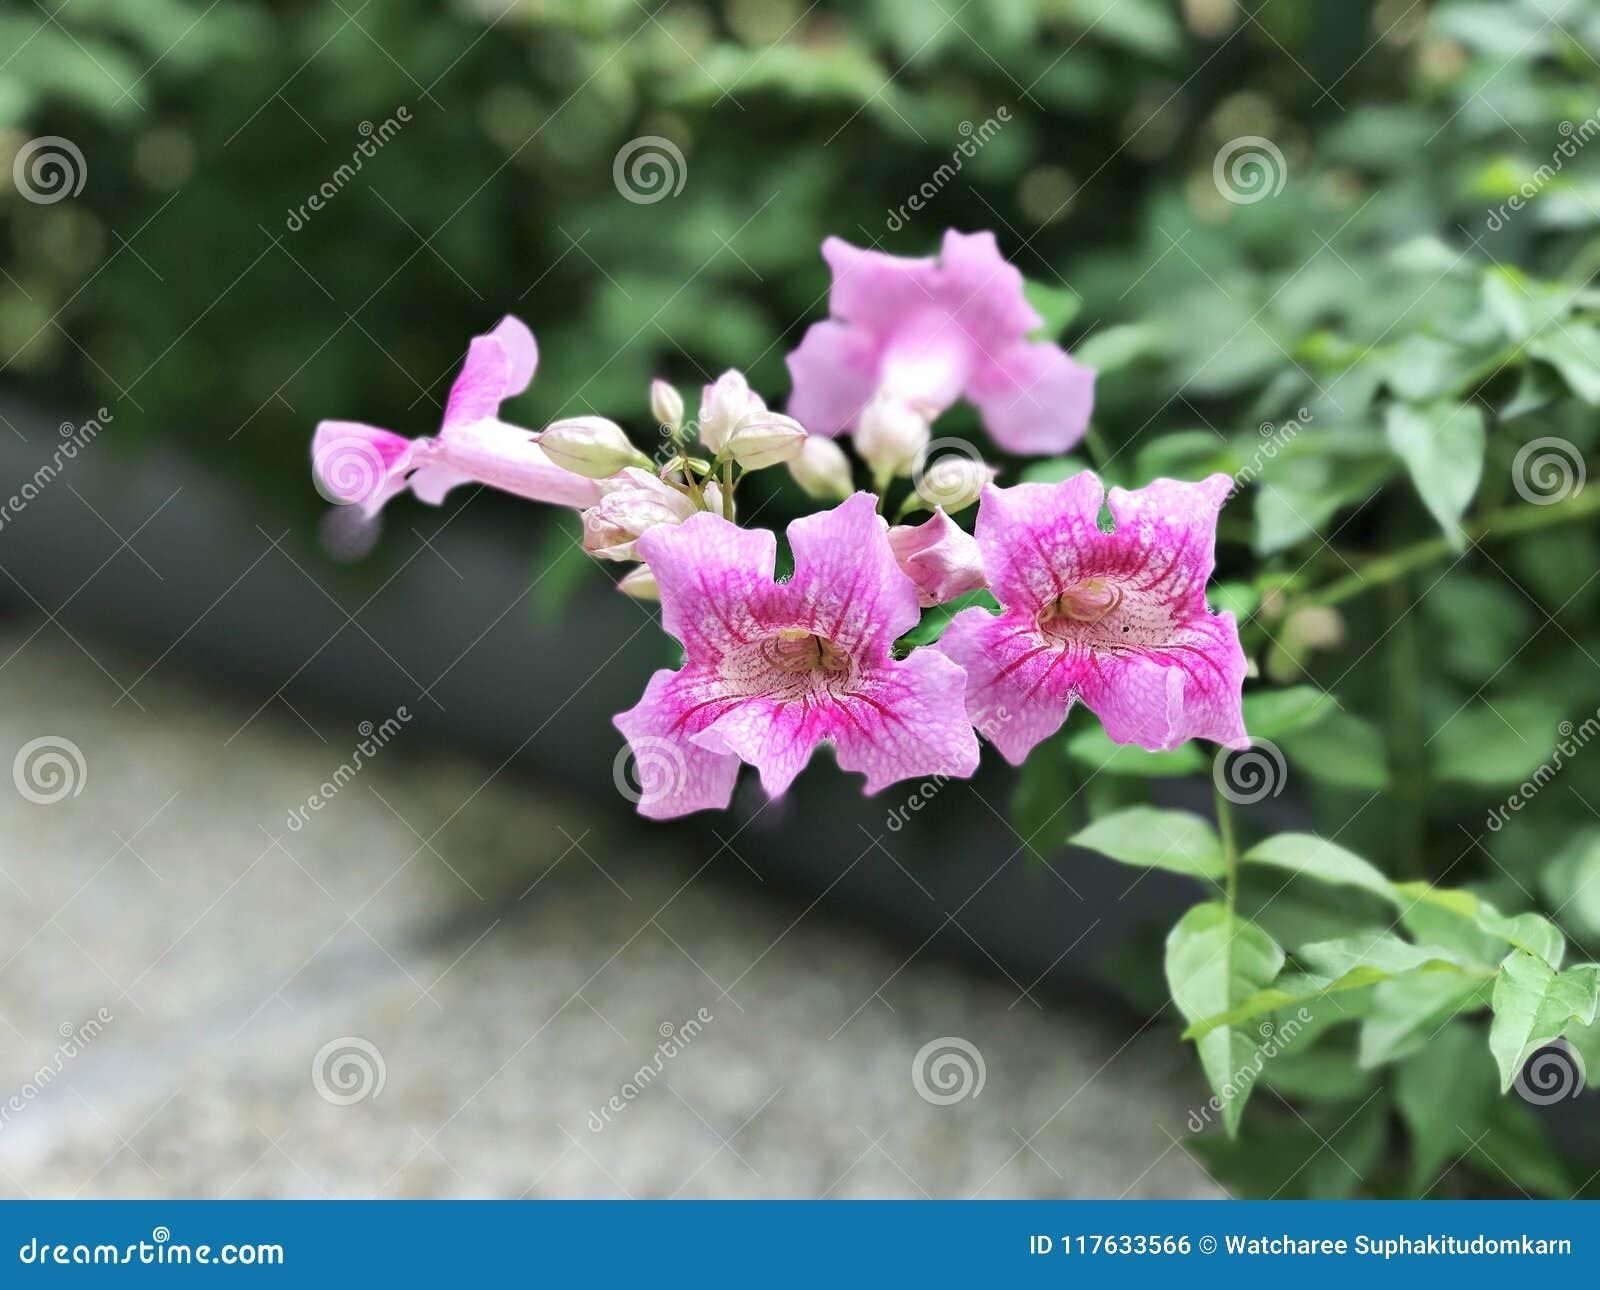 Pink trumpet vine or port sthns creeper or podranea ricasoliana download pink trumpet vine or port sthns creeper or podranea ricasoliana or mightylinksfo